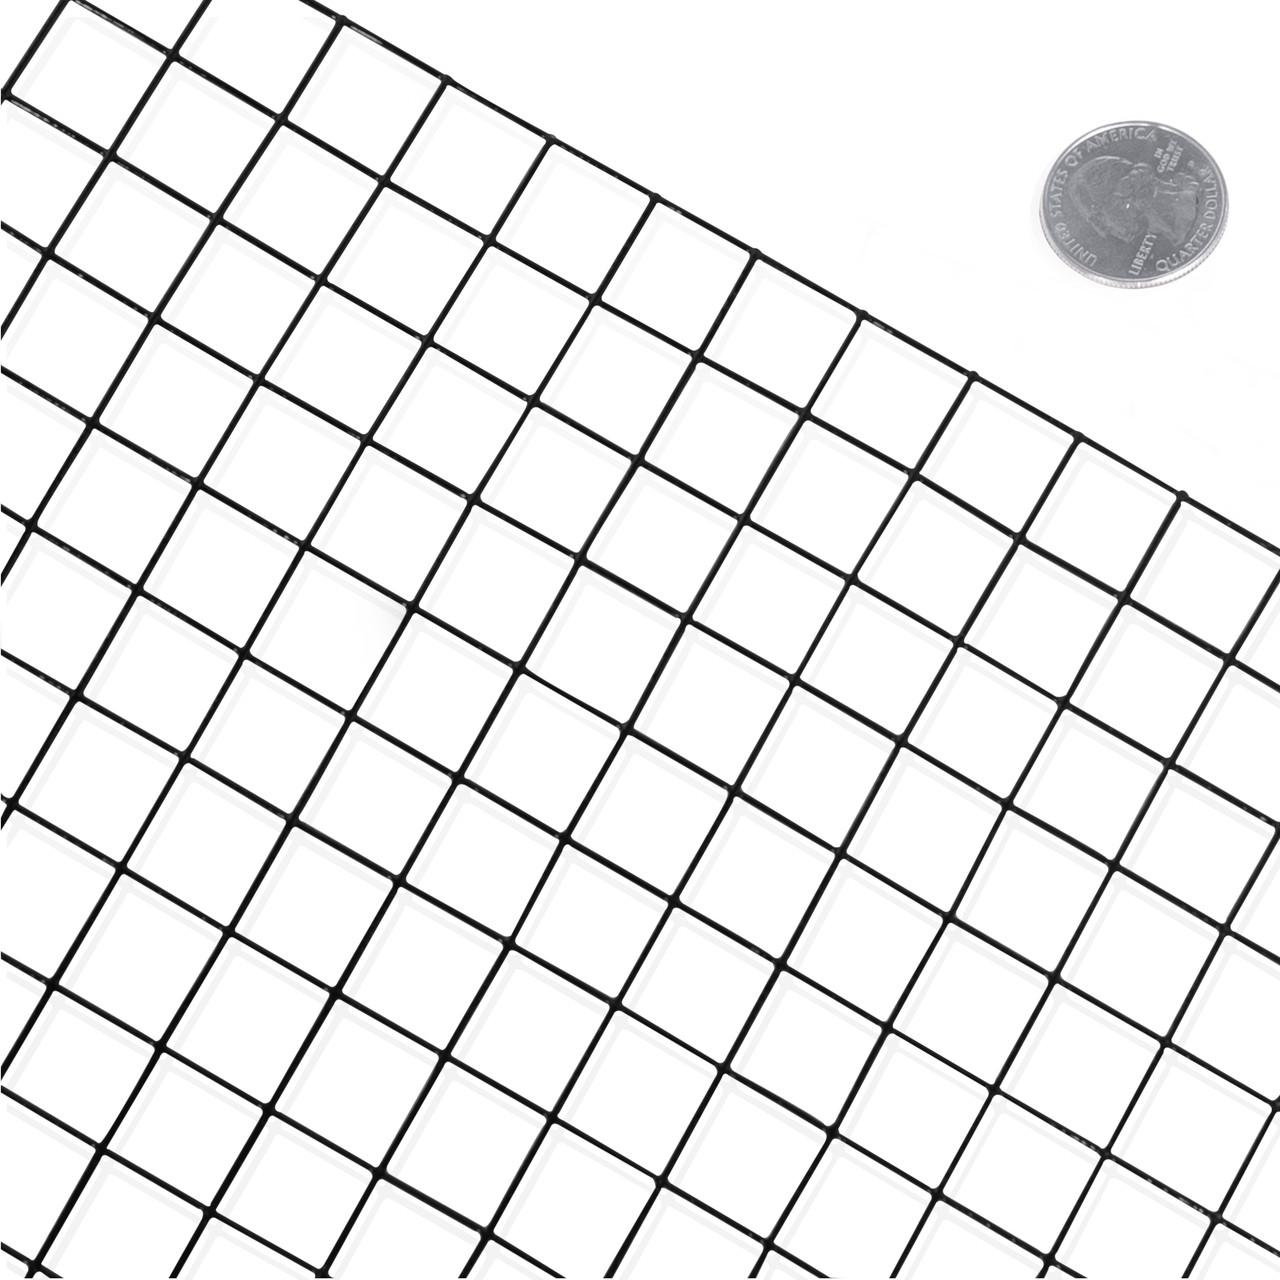 16 Gauge Black Vinyl Coated Welded Wire Mesh Size 1 Inch